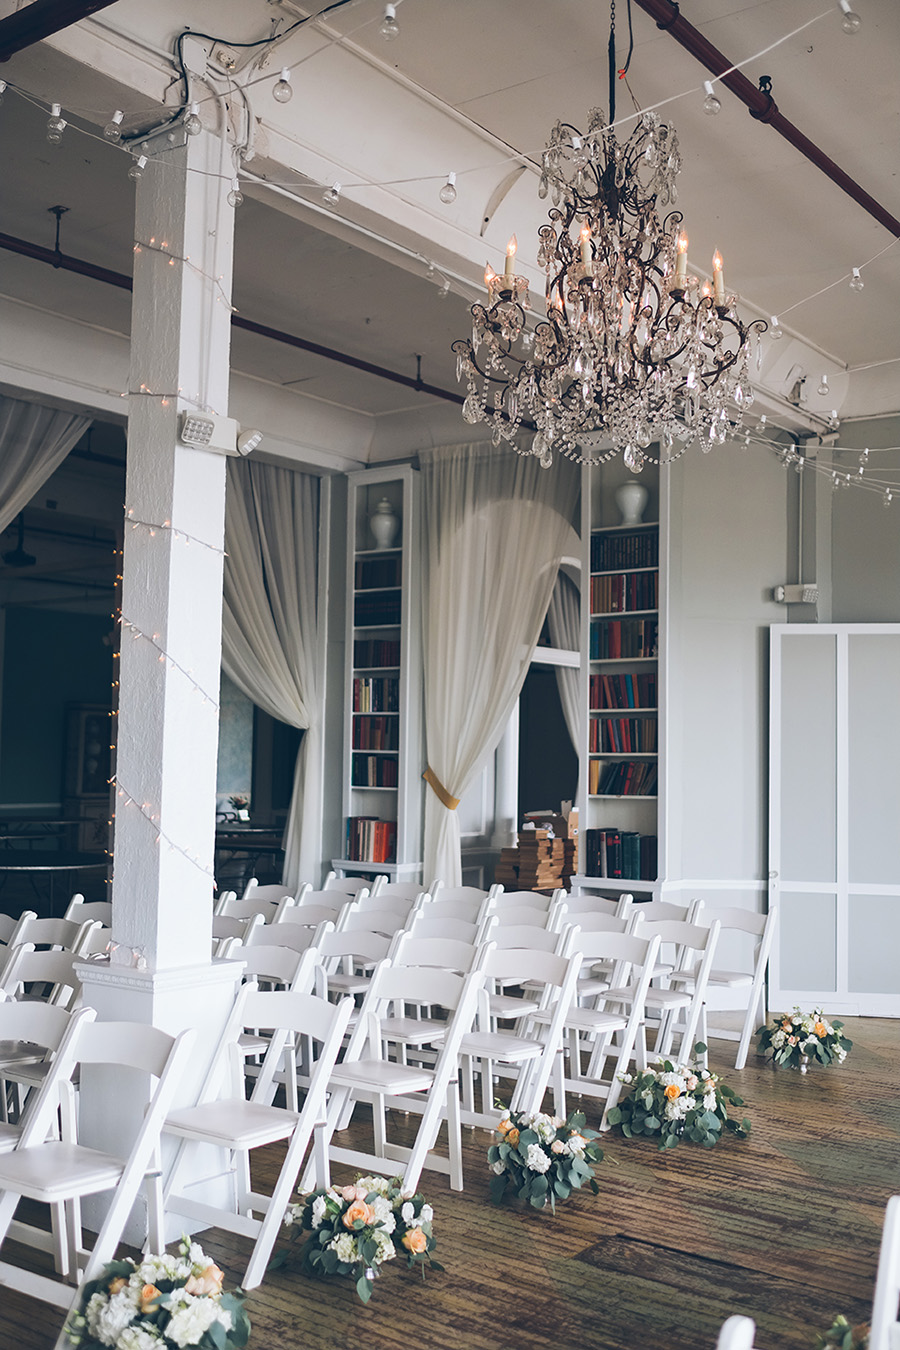 LIN-JOEY-NYC-WEDDING-METROPOLITANBUILDING-DETAILS-CYNTHIACHUNG-0100.jpg